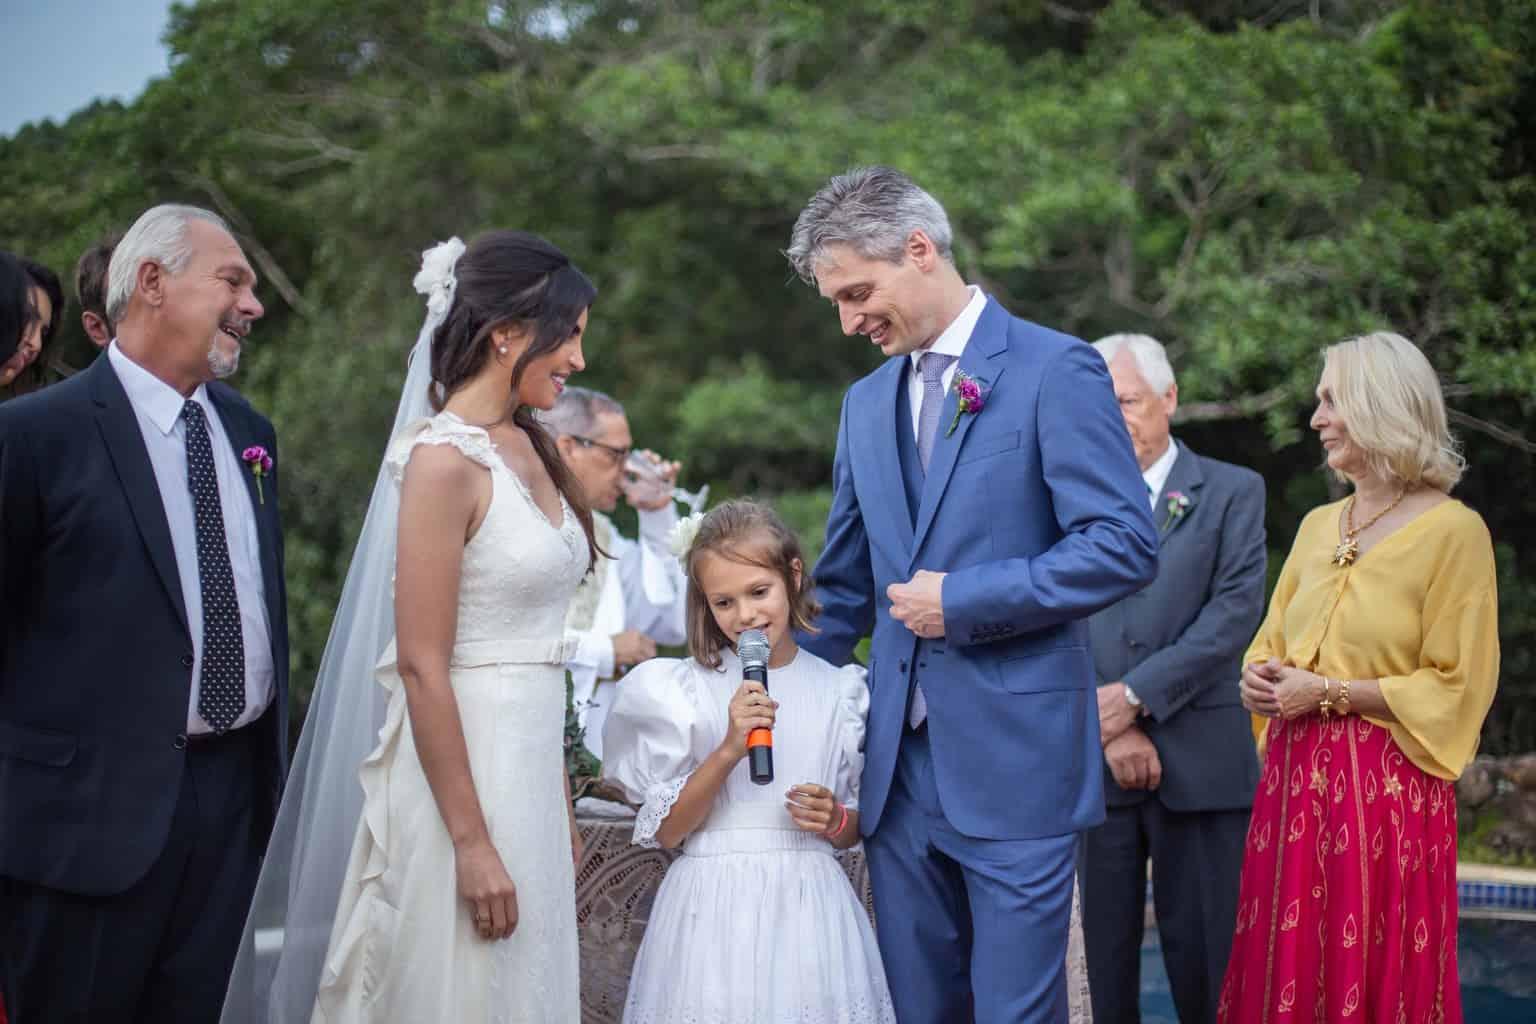 casamento-na-serra-cerimonia-ao-ar-livre-Fotografia-Laura-Campanella-graviola-filmes-Juliana-e-Sebastian-Pousada-La-Belle-Bruna255